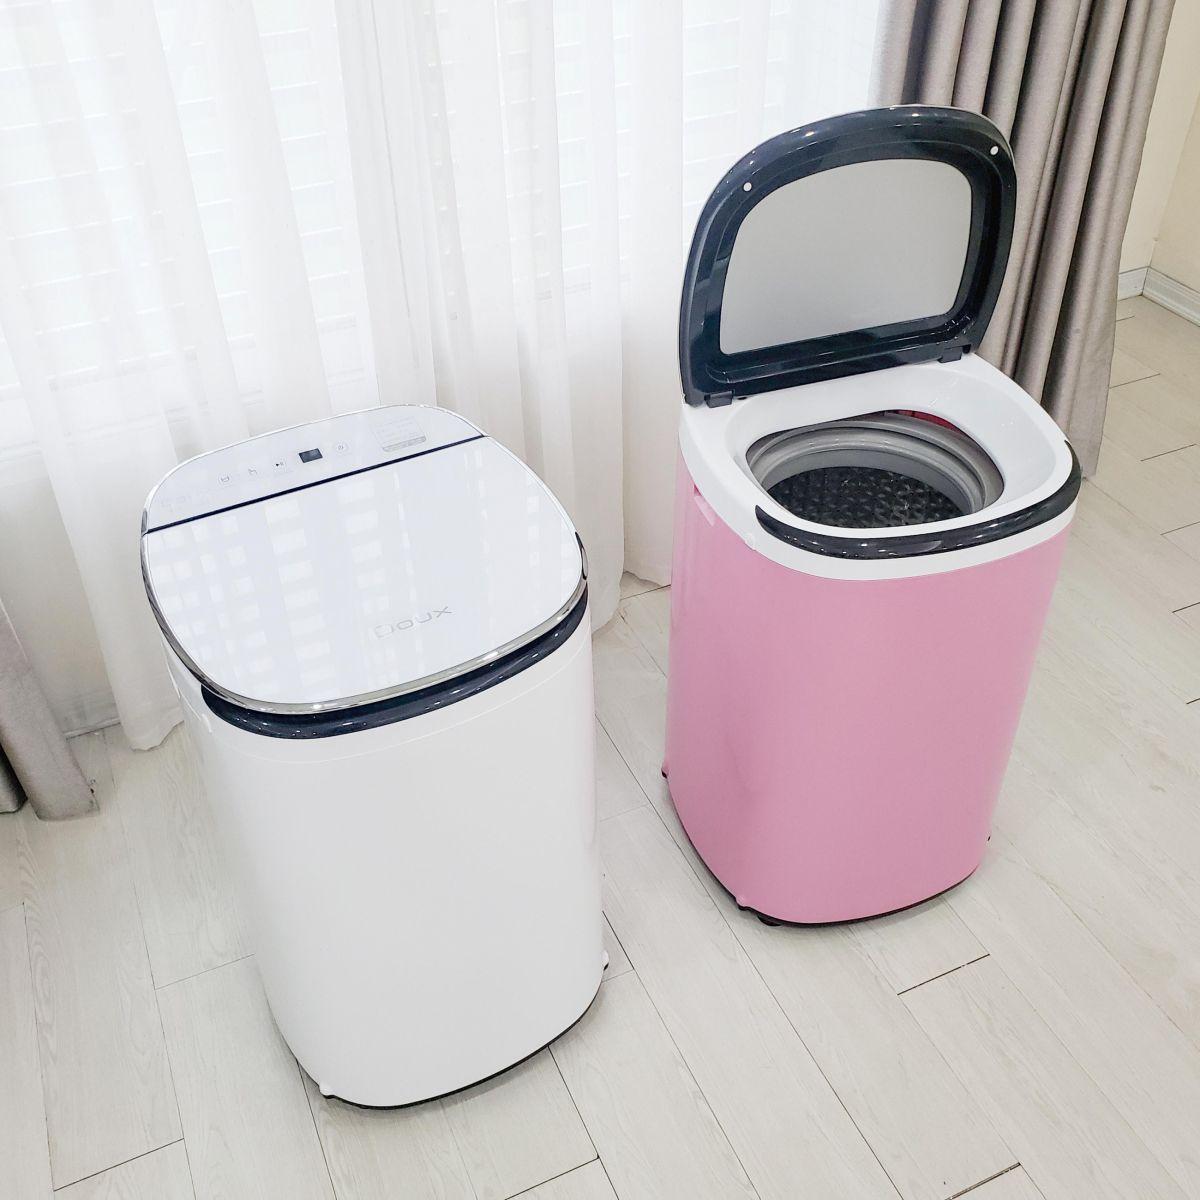 Máy Giặt Mini Doux Lux Màu Trắng